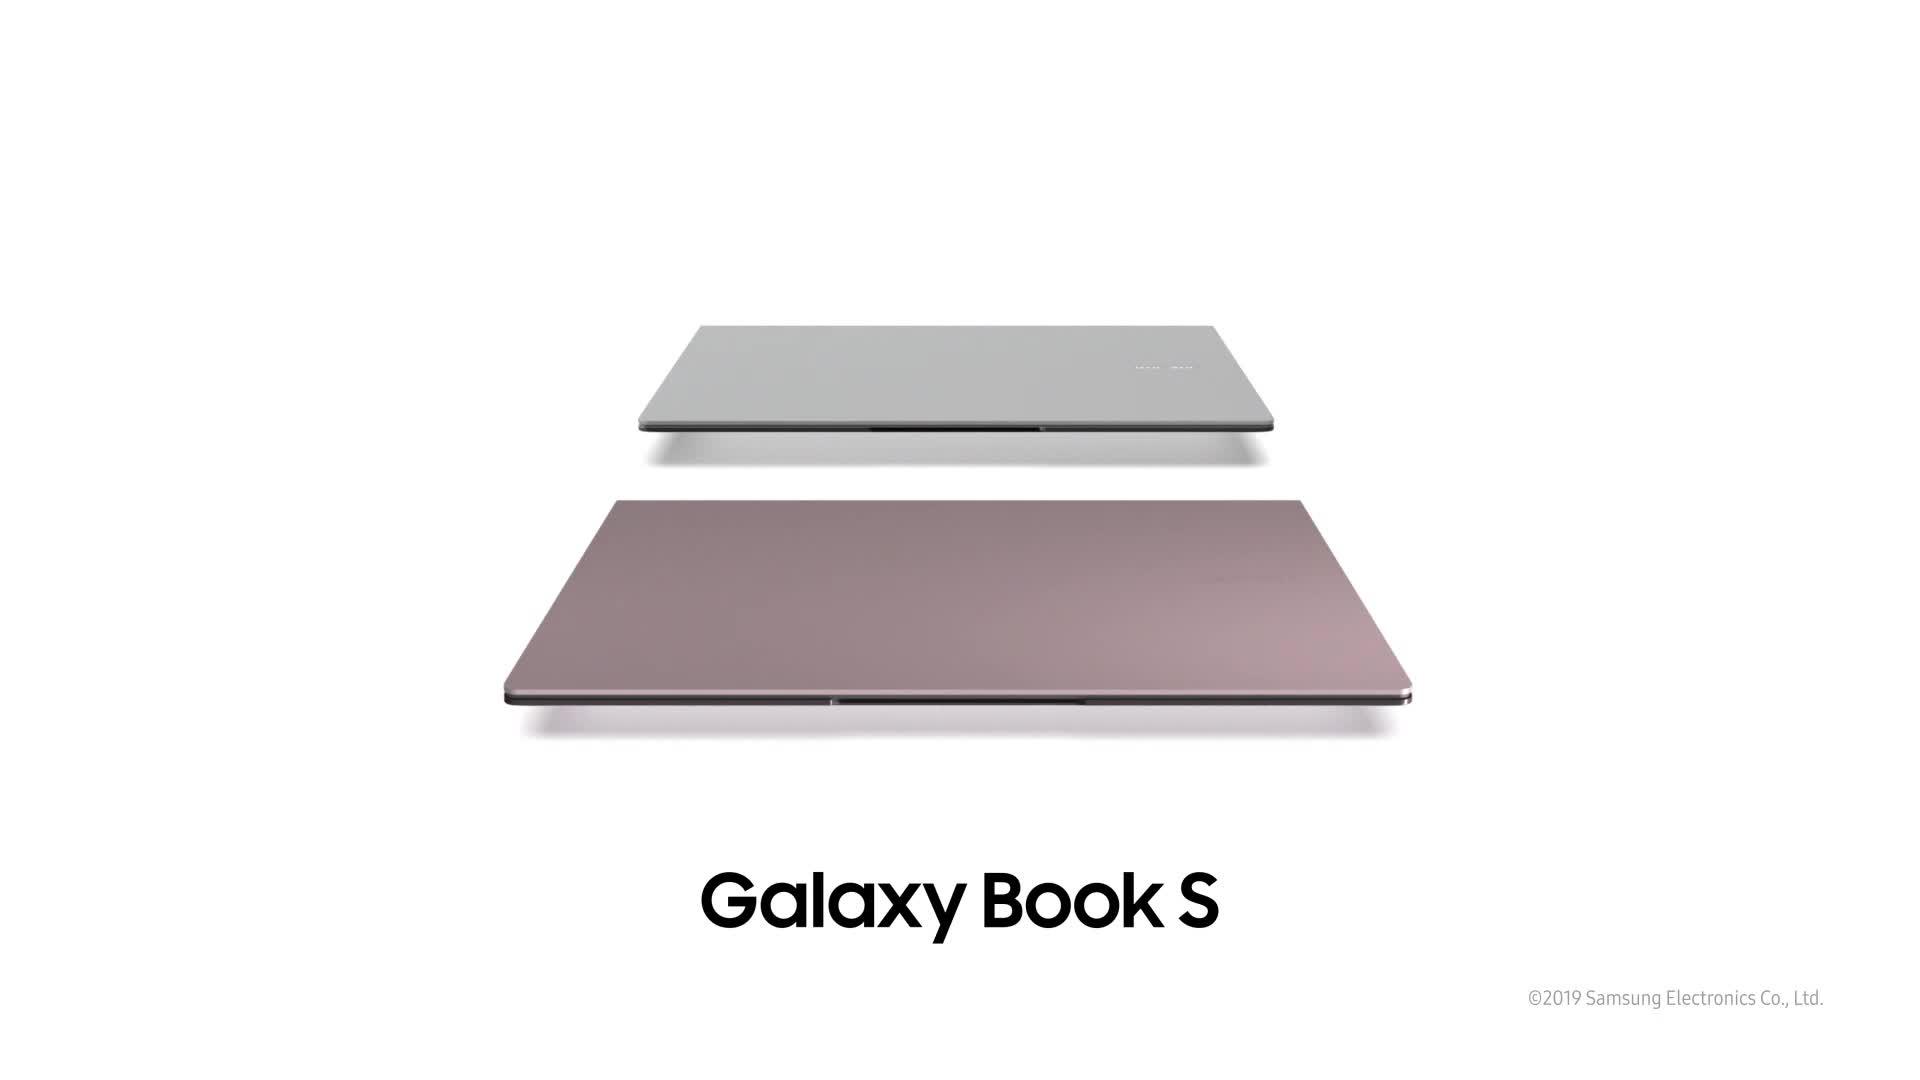 Samsung, Samsung Galaxy Book S, Galaxy Book S